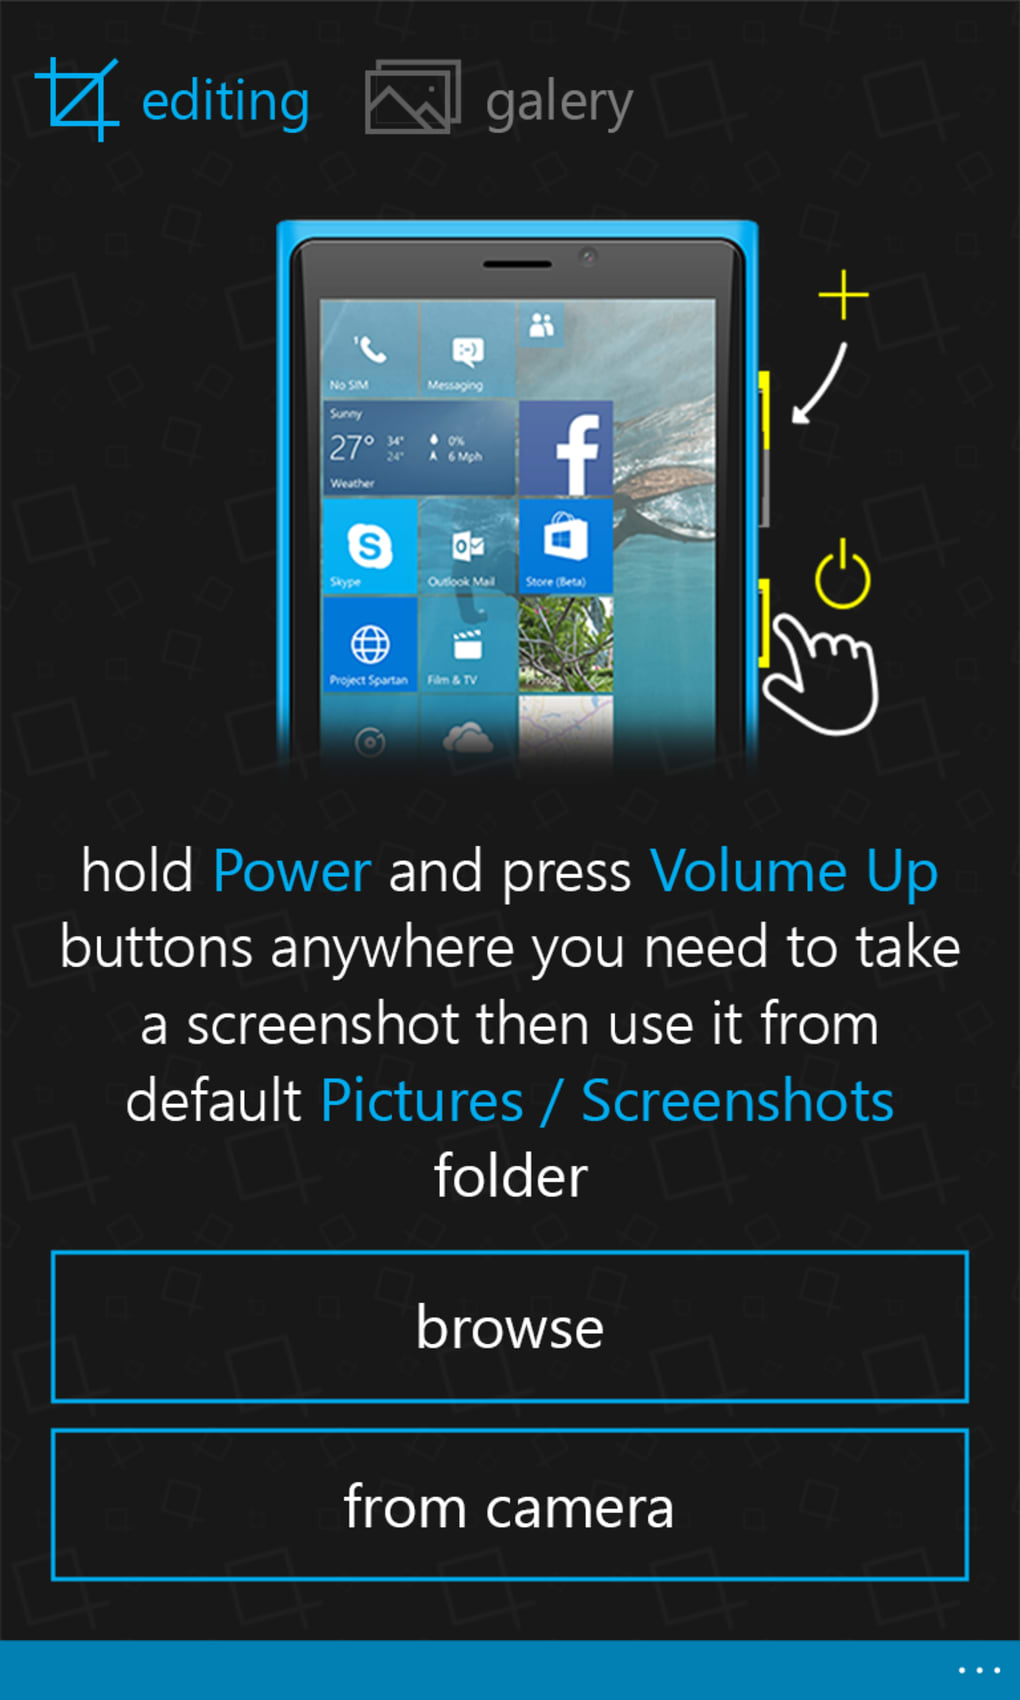 Download free screenshot tool